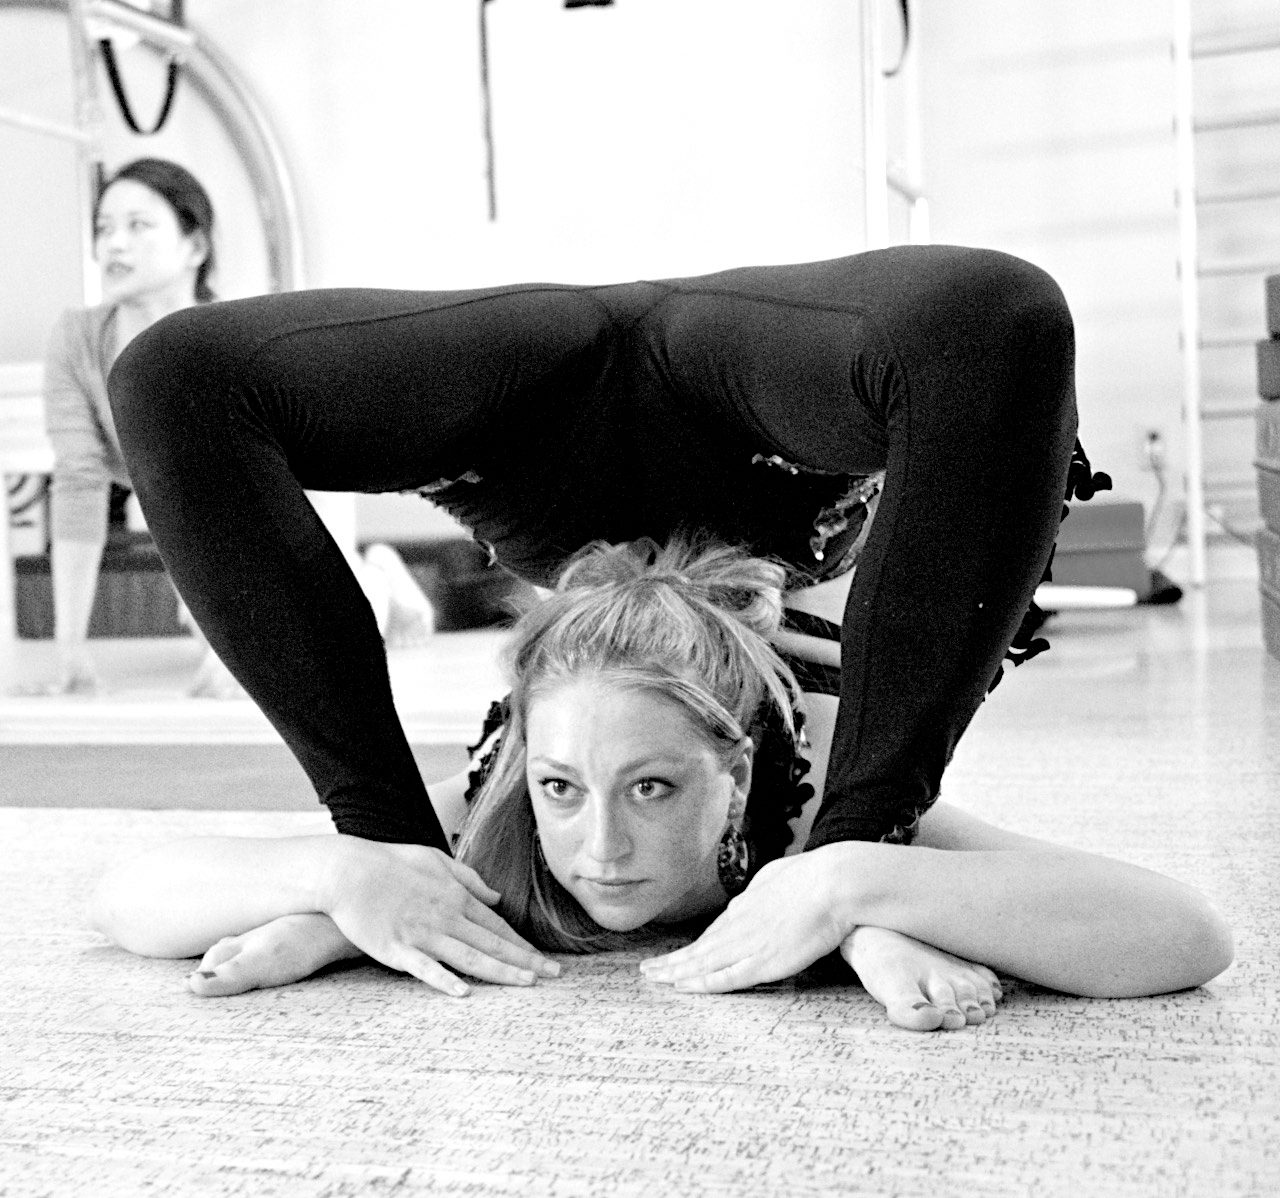 aryn contortion pretzel.jpg